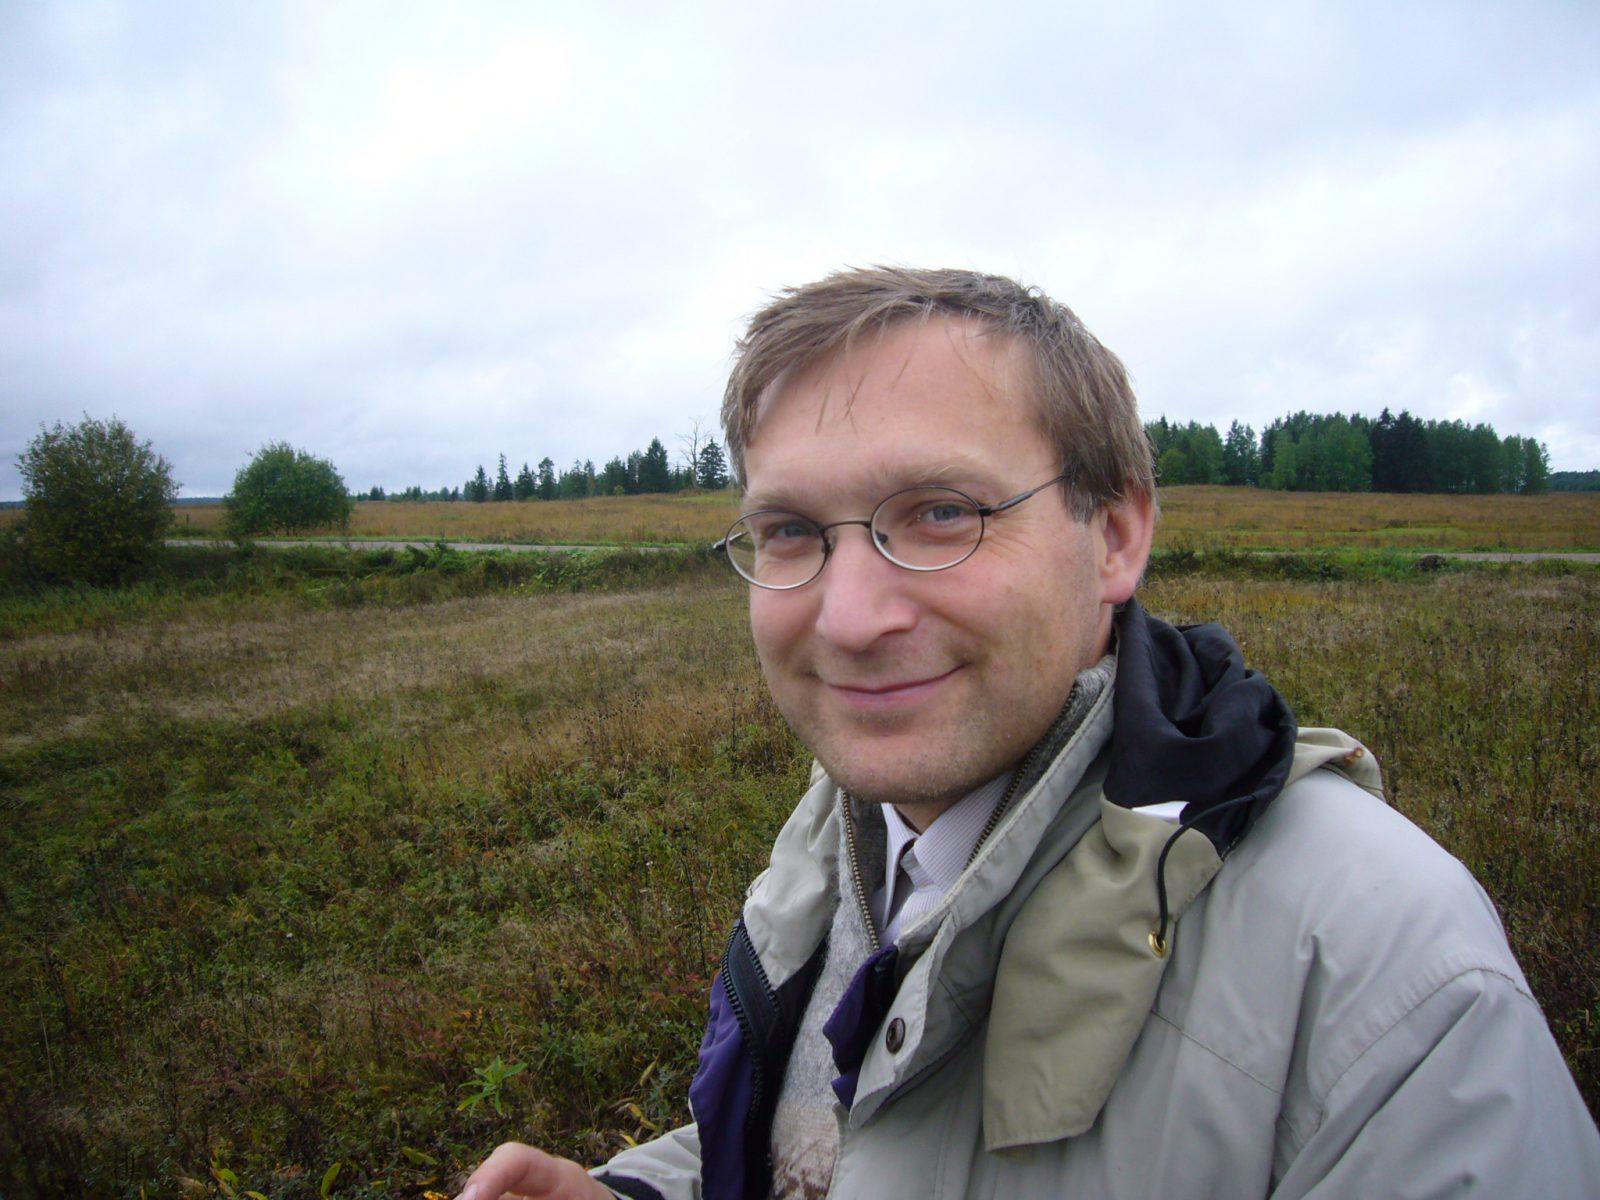 Meelis Pärtel biodiversità oscura ecologia